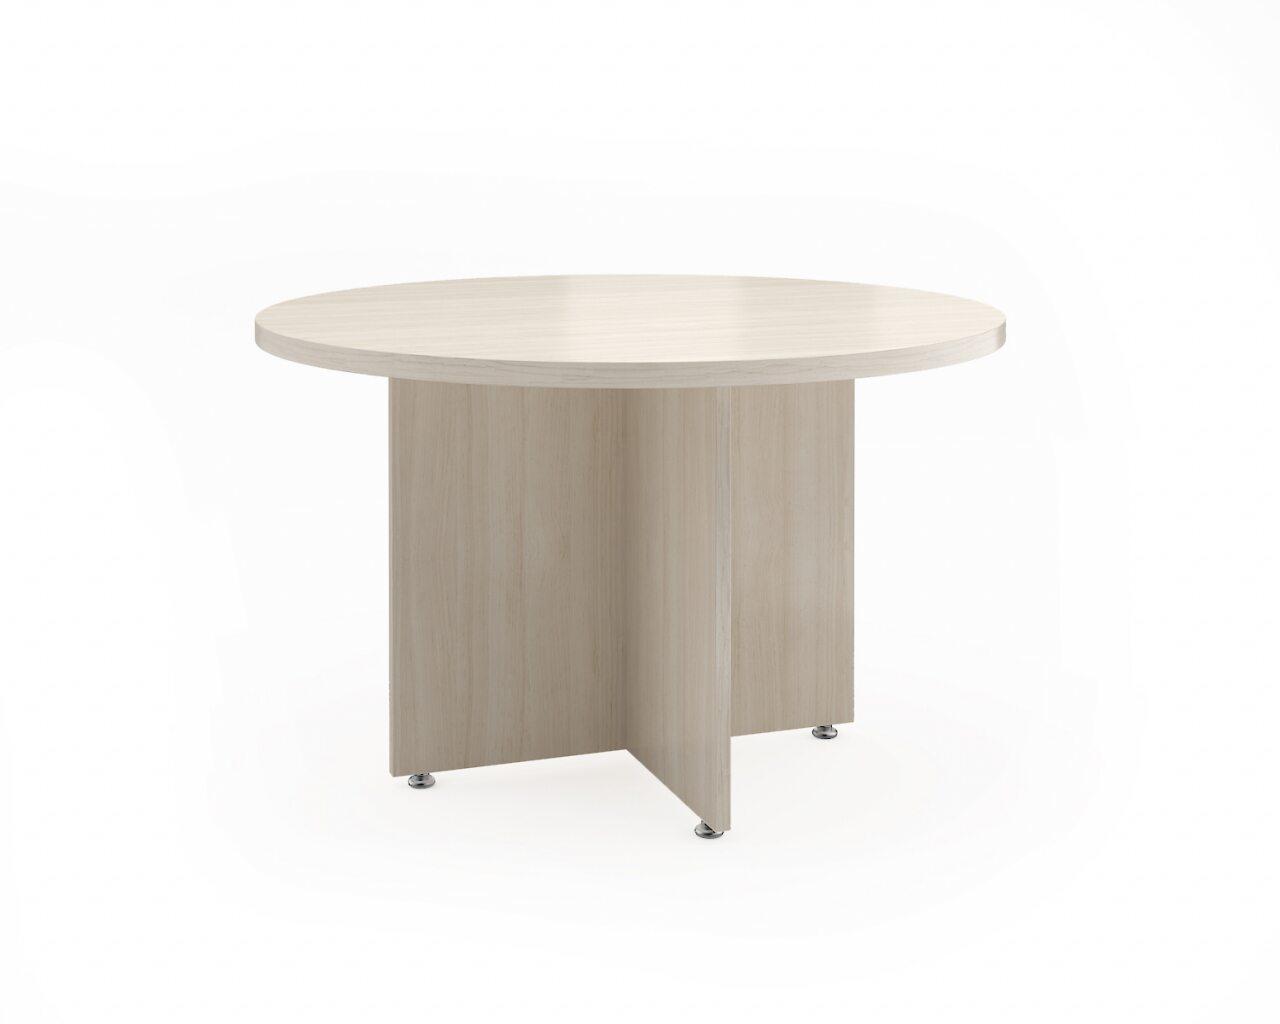 Стол для заседаний круглый Статус 120x120x75 - фото 1